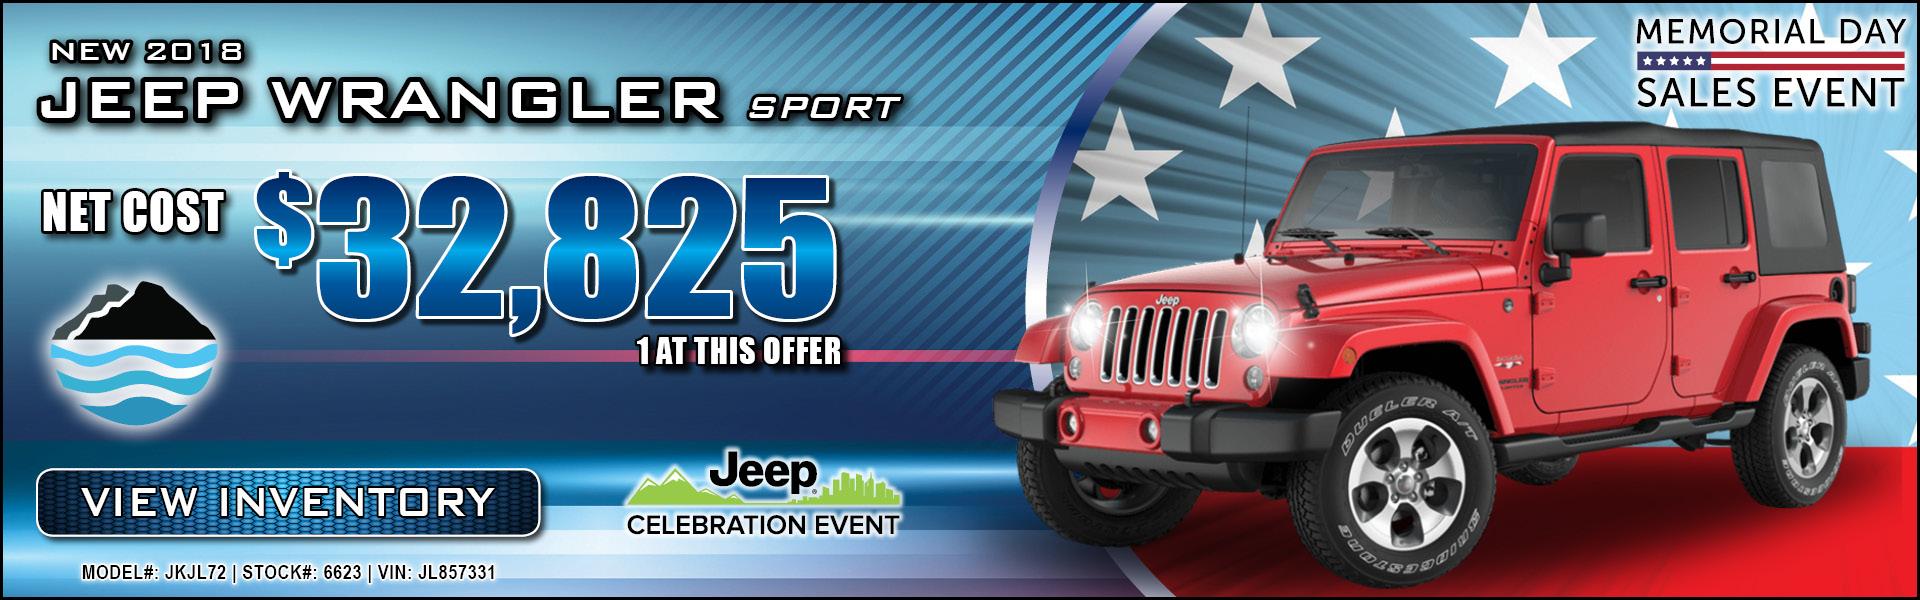 Jeep Wrangler JK $32,825